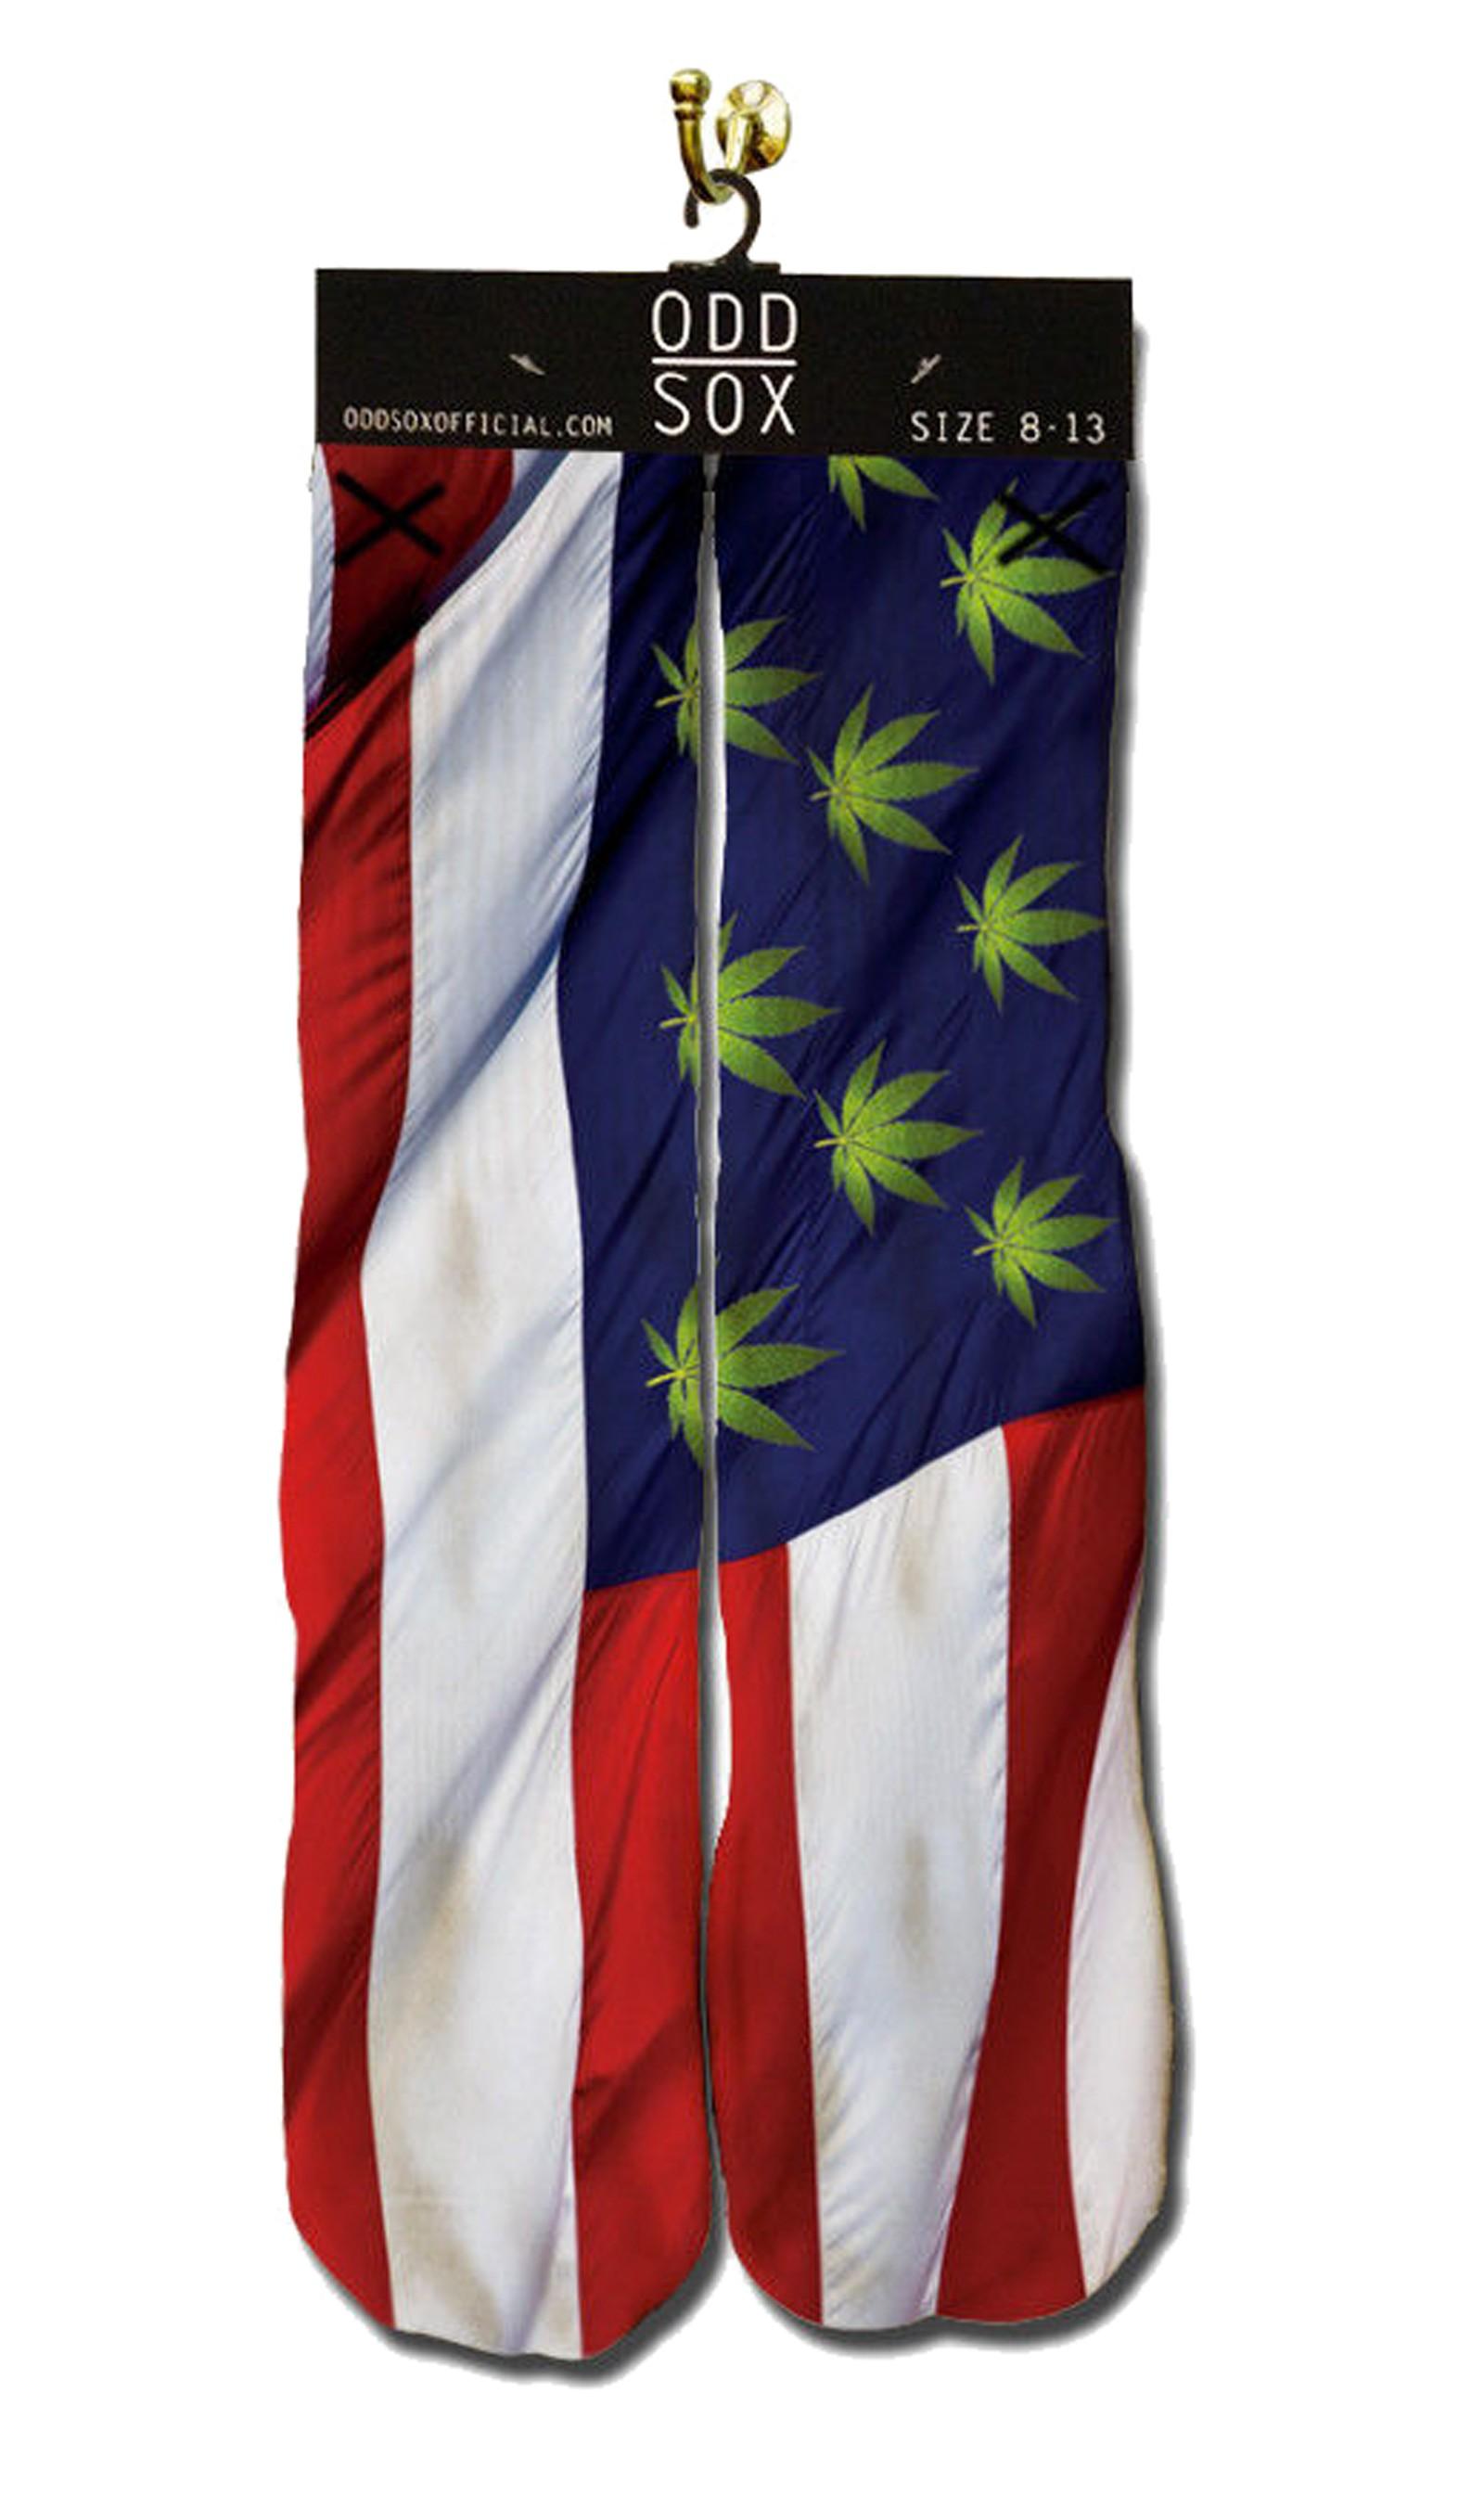 ODD Sox - USA Weed Socken Front